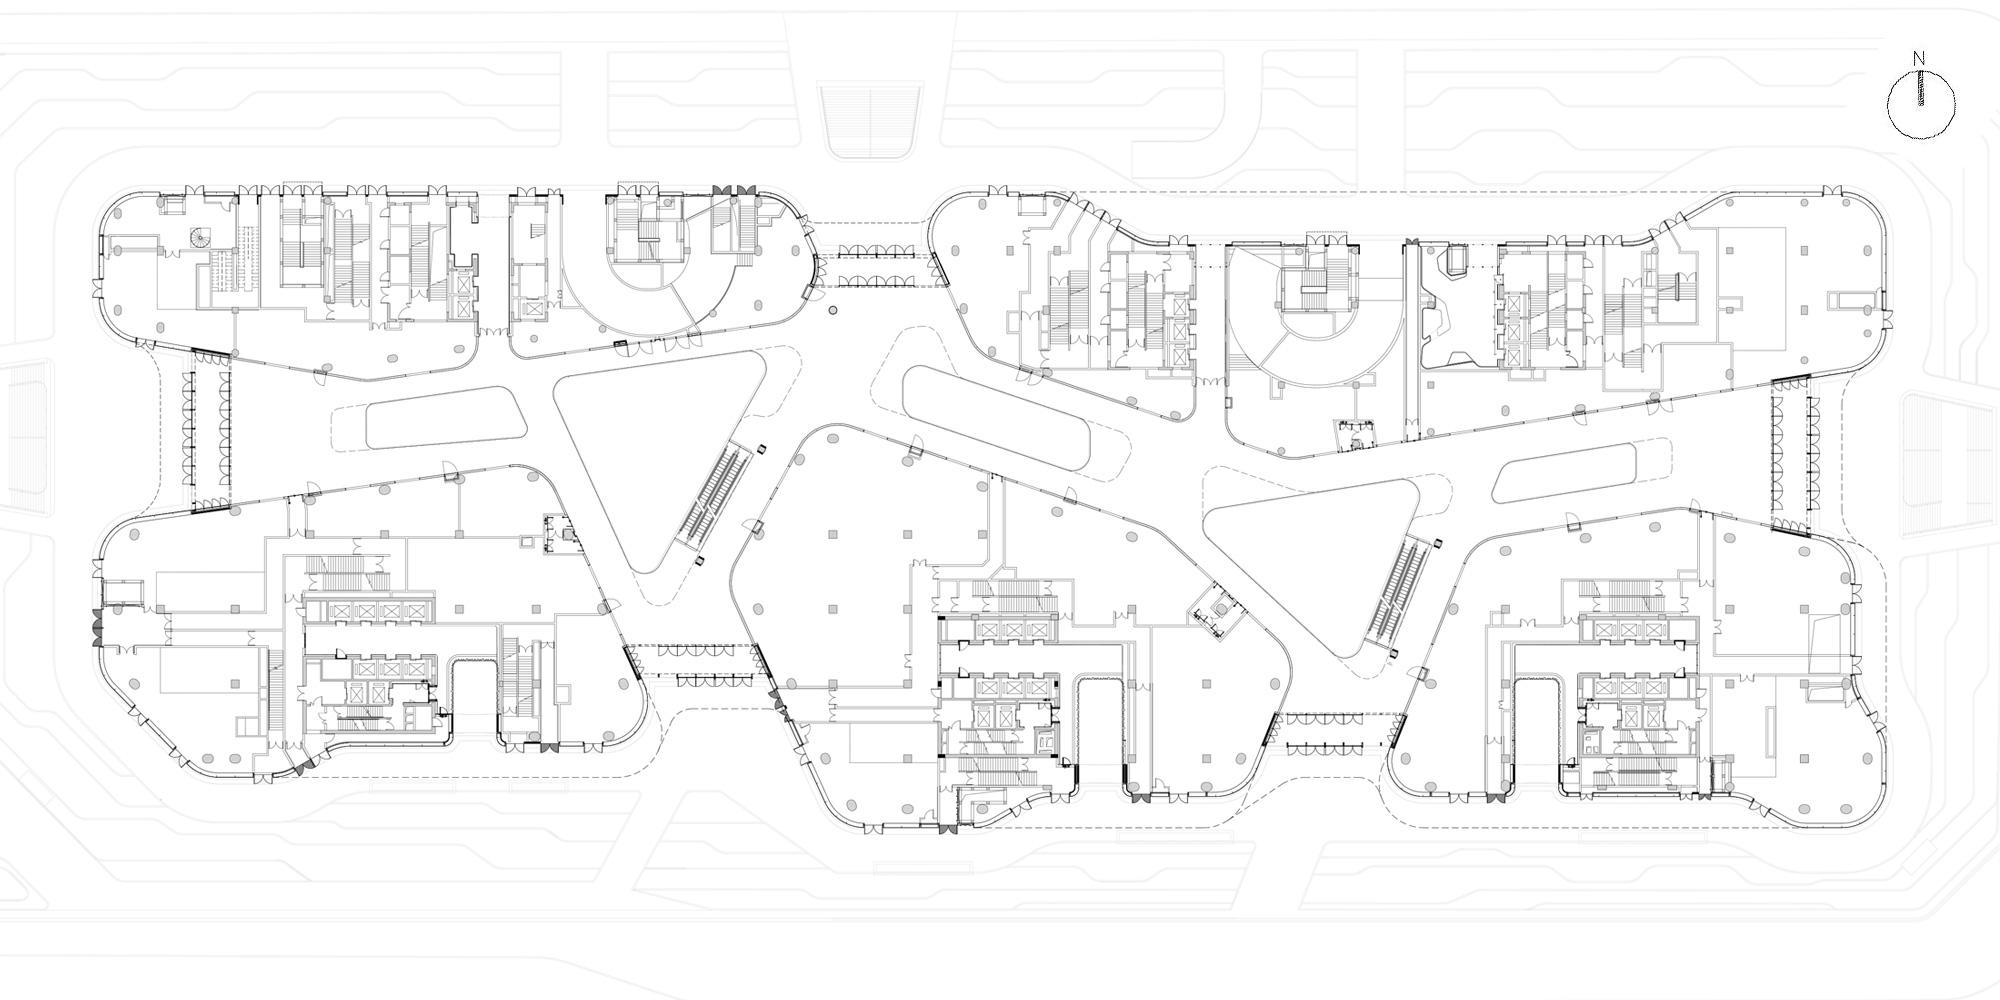 Pianta Piano Primo © gmp - von Gerkan, Marg and Partners Architects